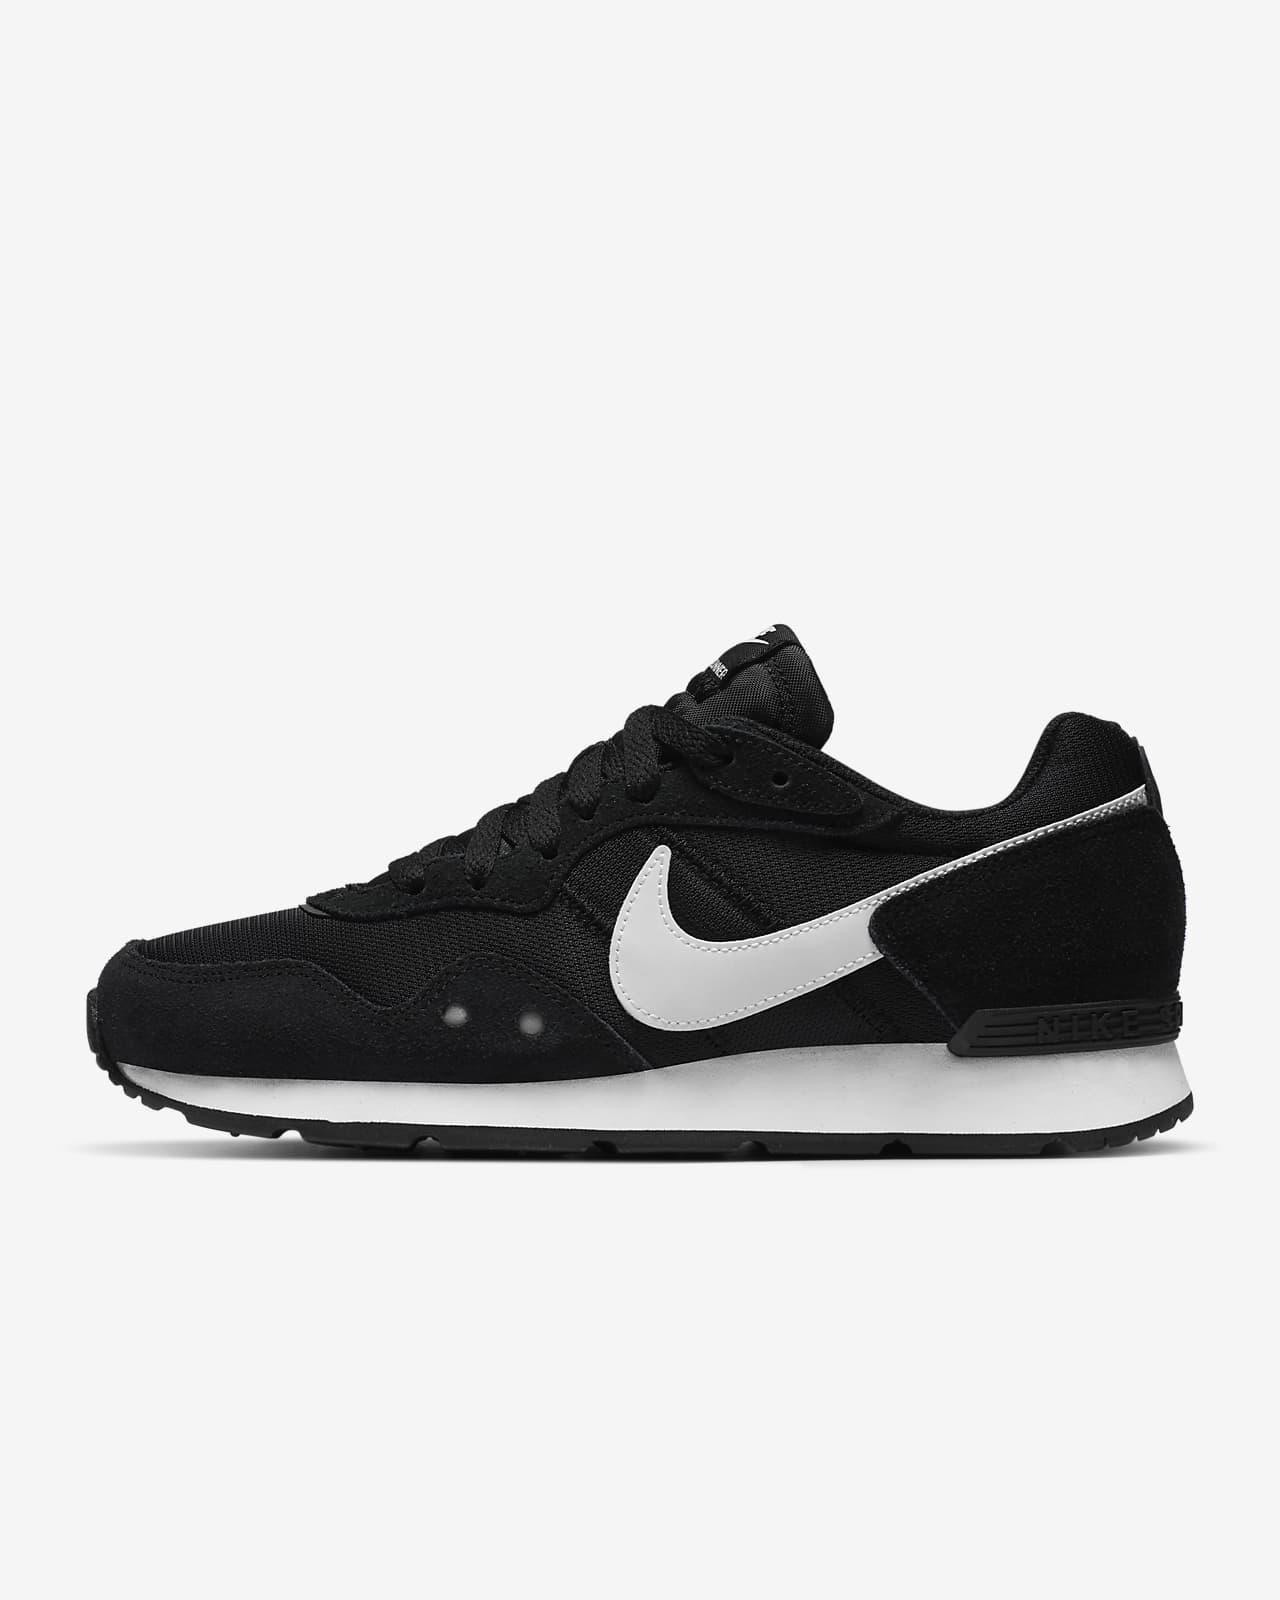 Nike Venture Runner Women's Shoe